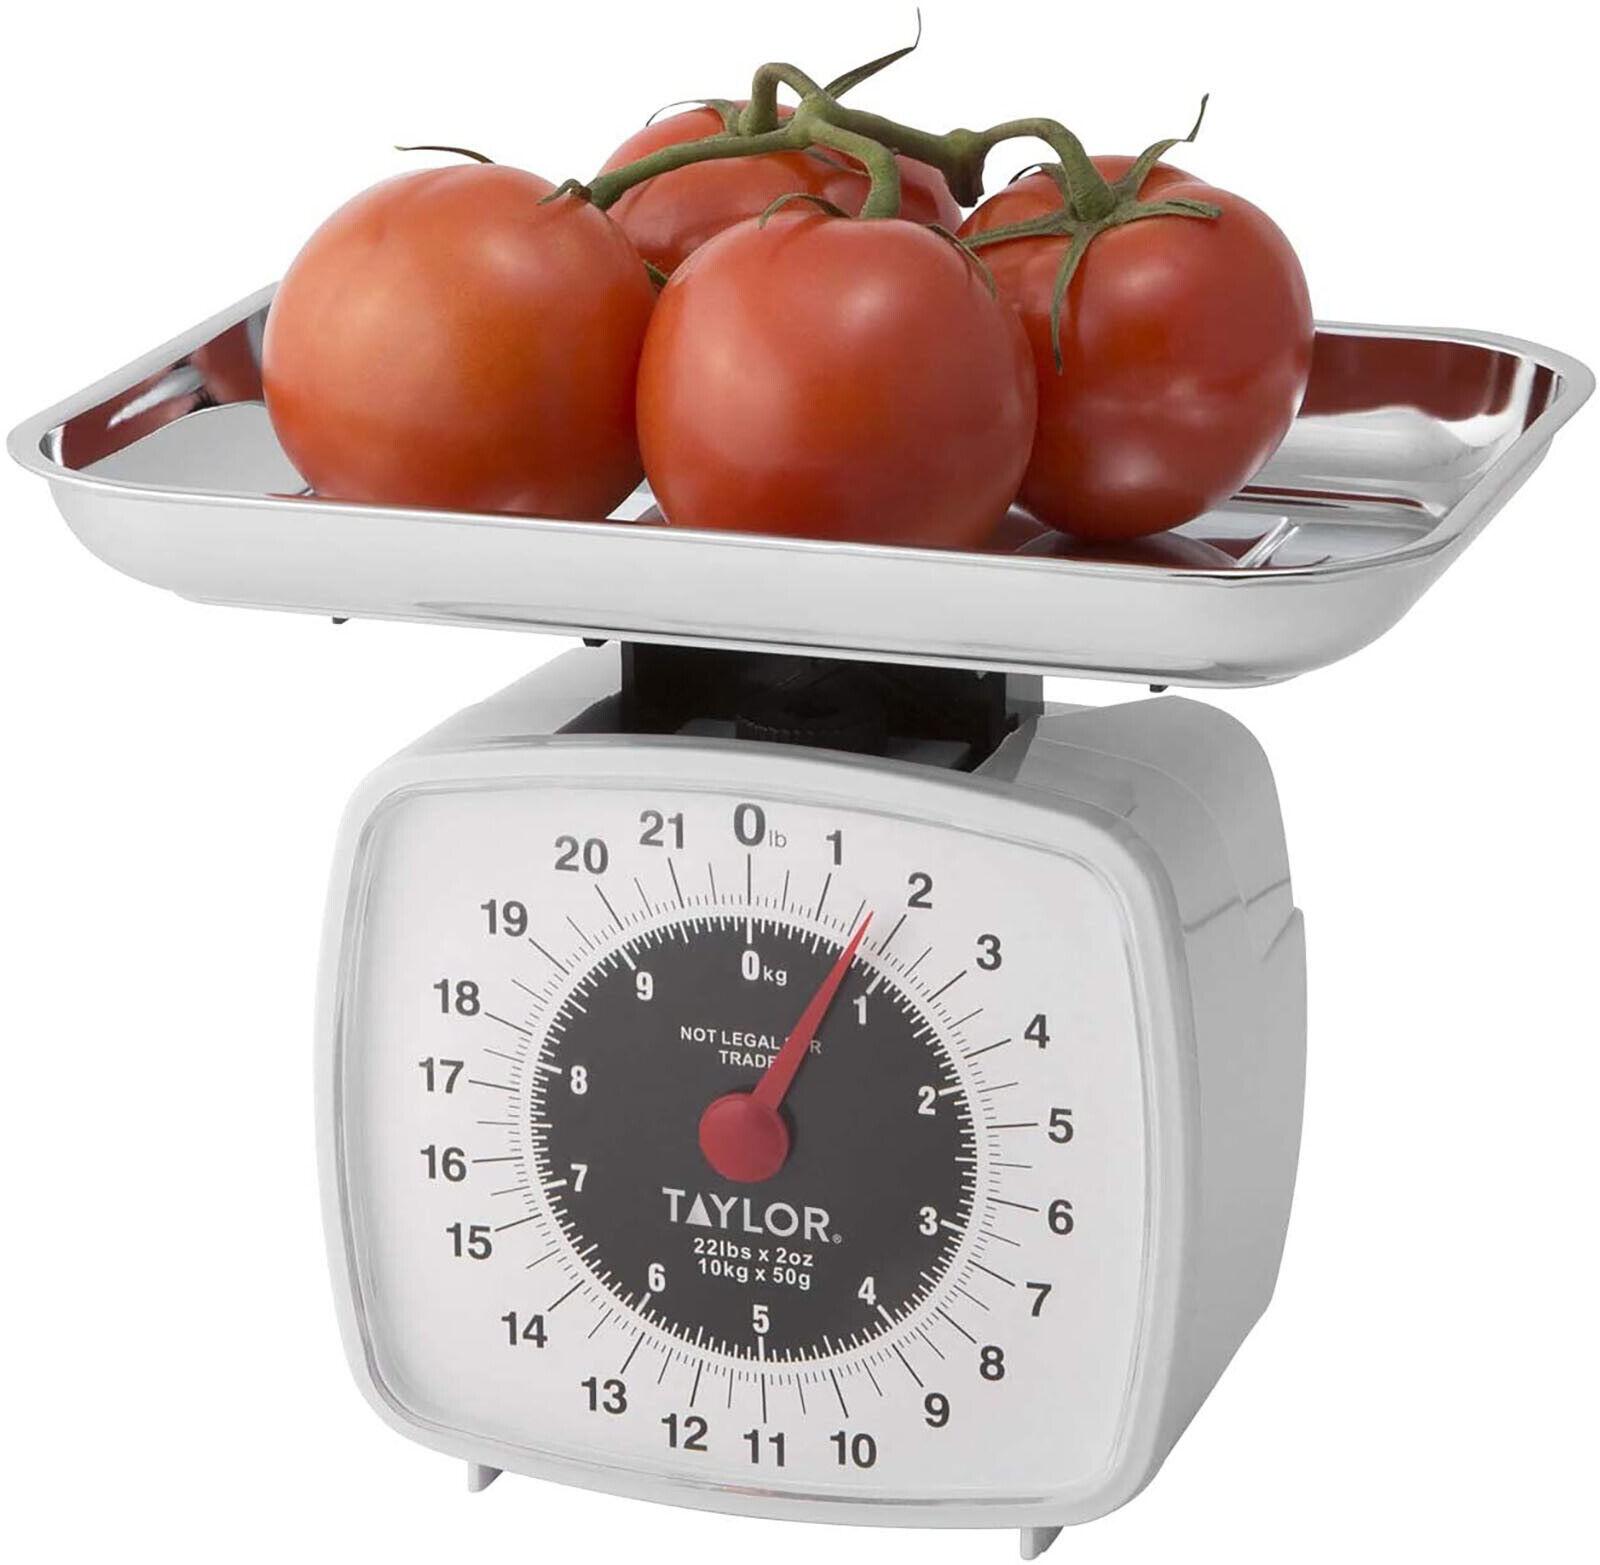 Food Kitchen Scale 22-Pound/10-Kilogram Analog Display Fruit